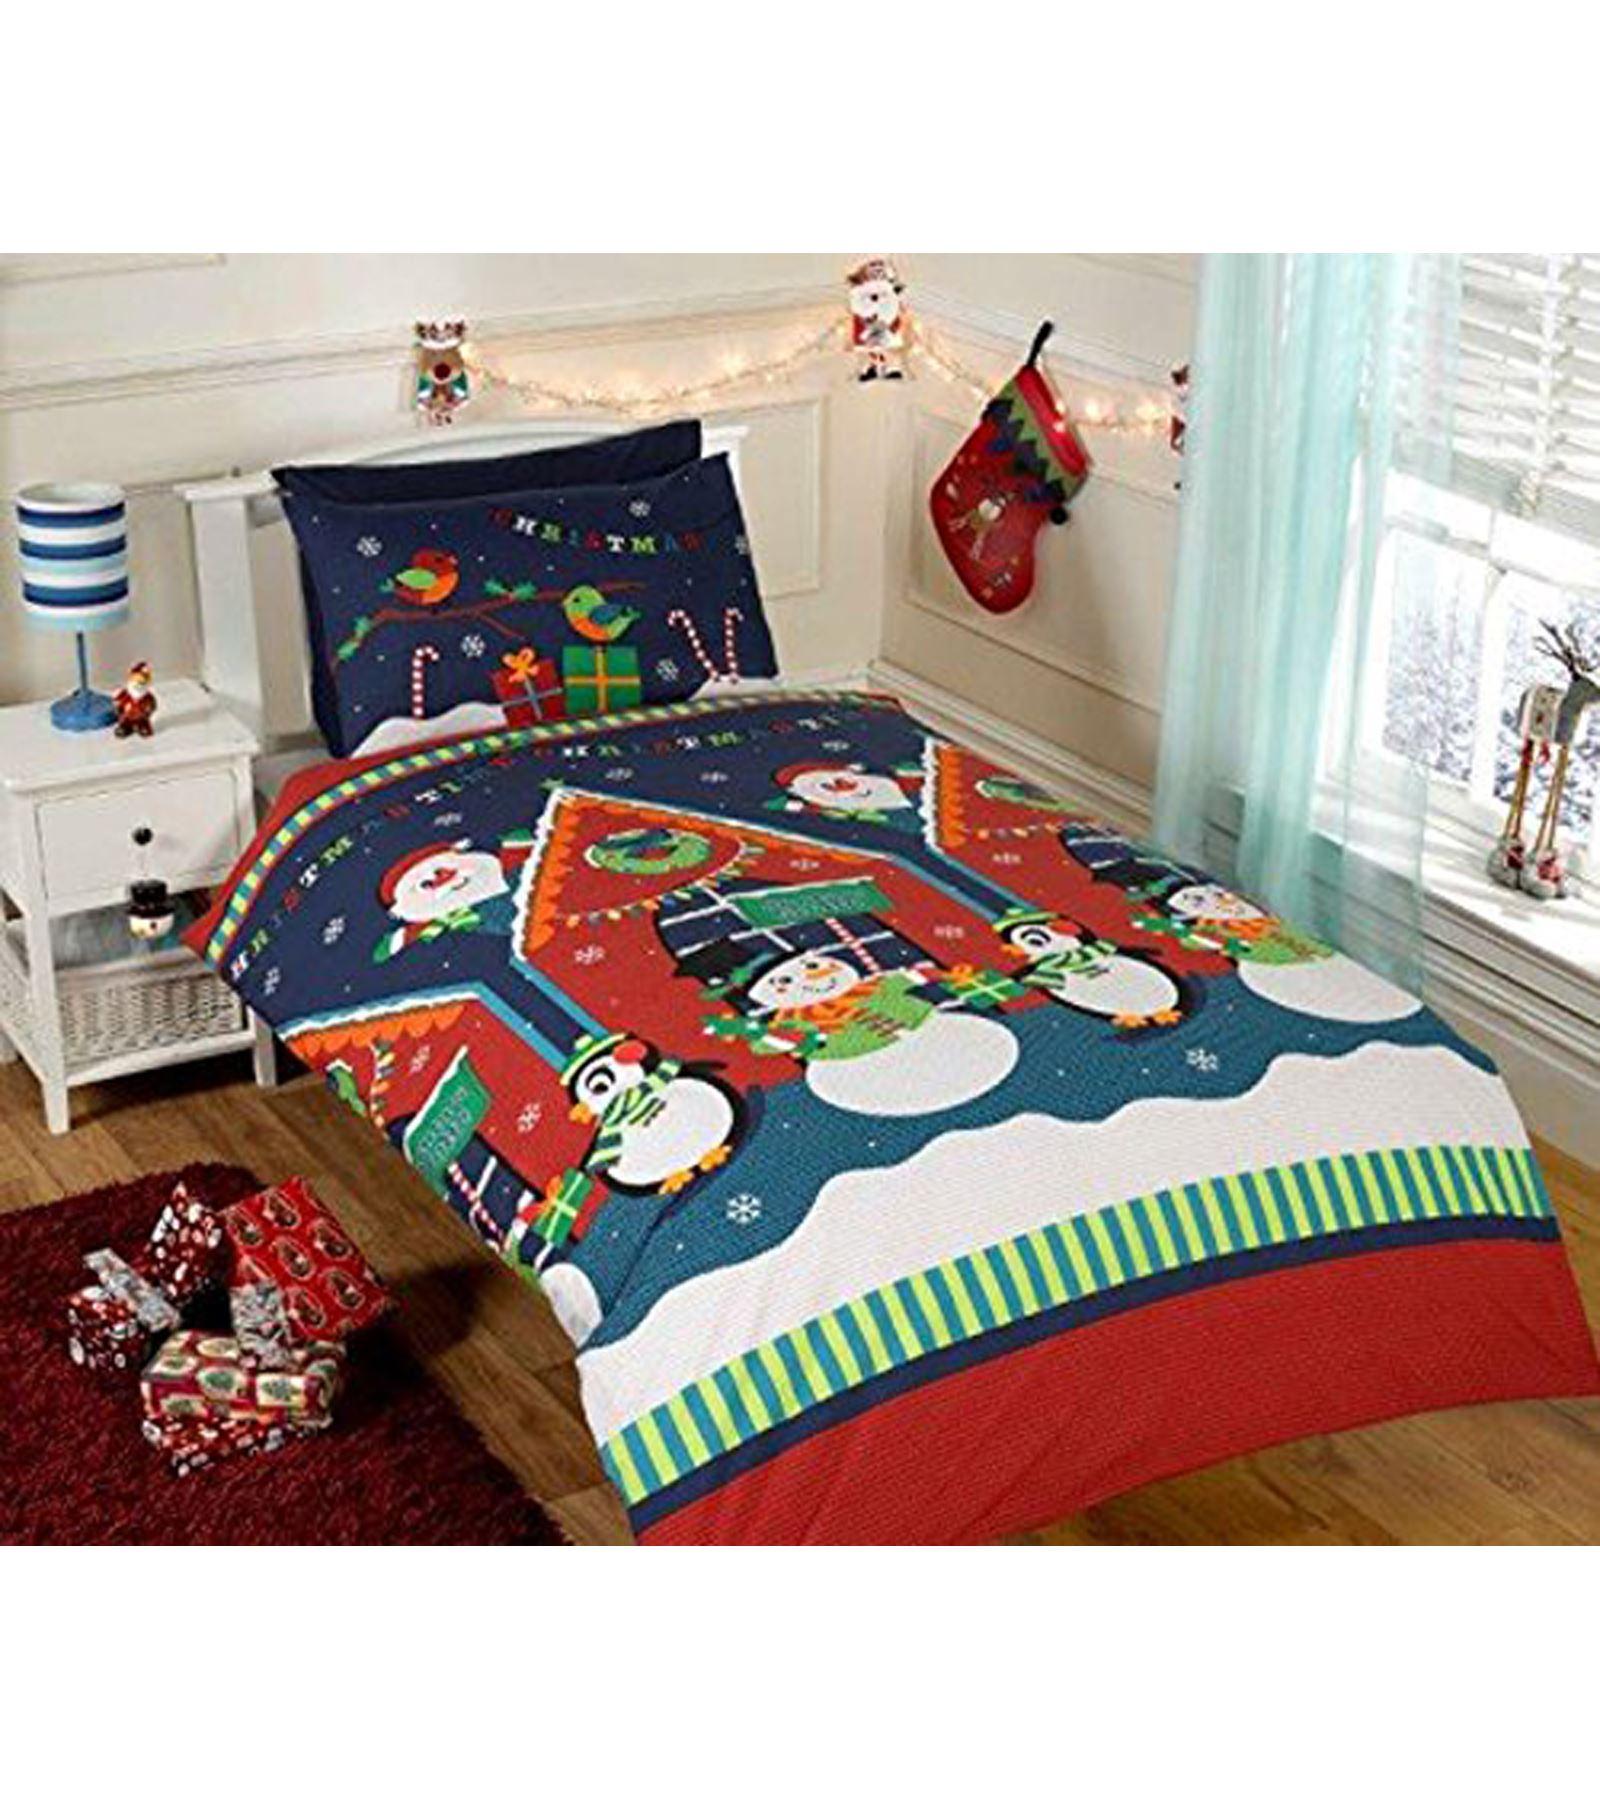 CHRISTMAS DUVET COVER BEDDING SETS – TWIN DOUBLE & JUNIOR – SANTA ... : single bed quilt sets - Adamdwight.com